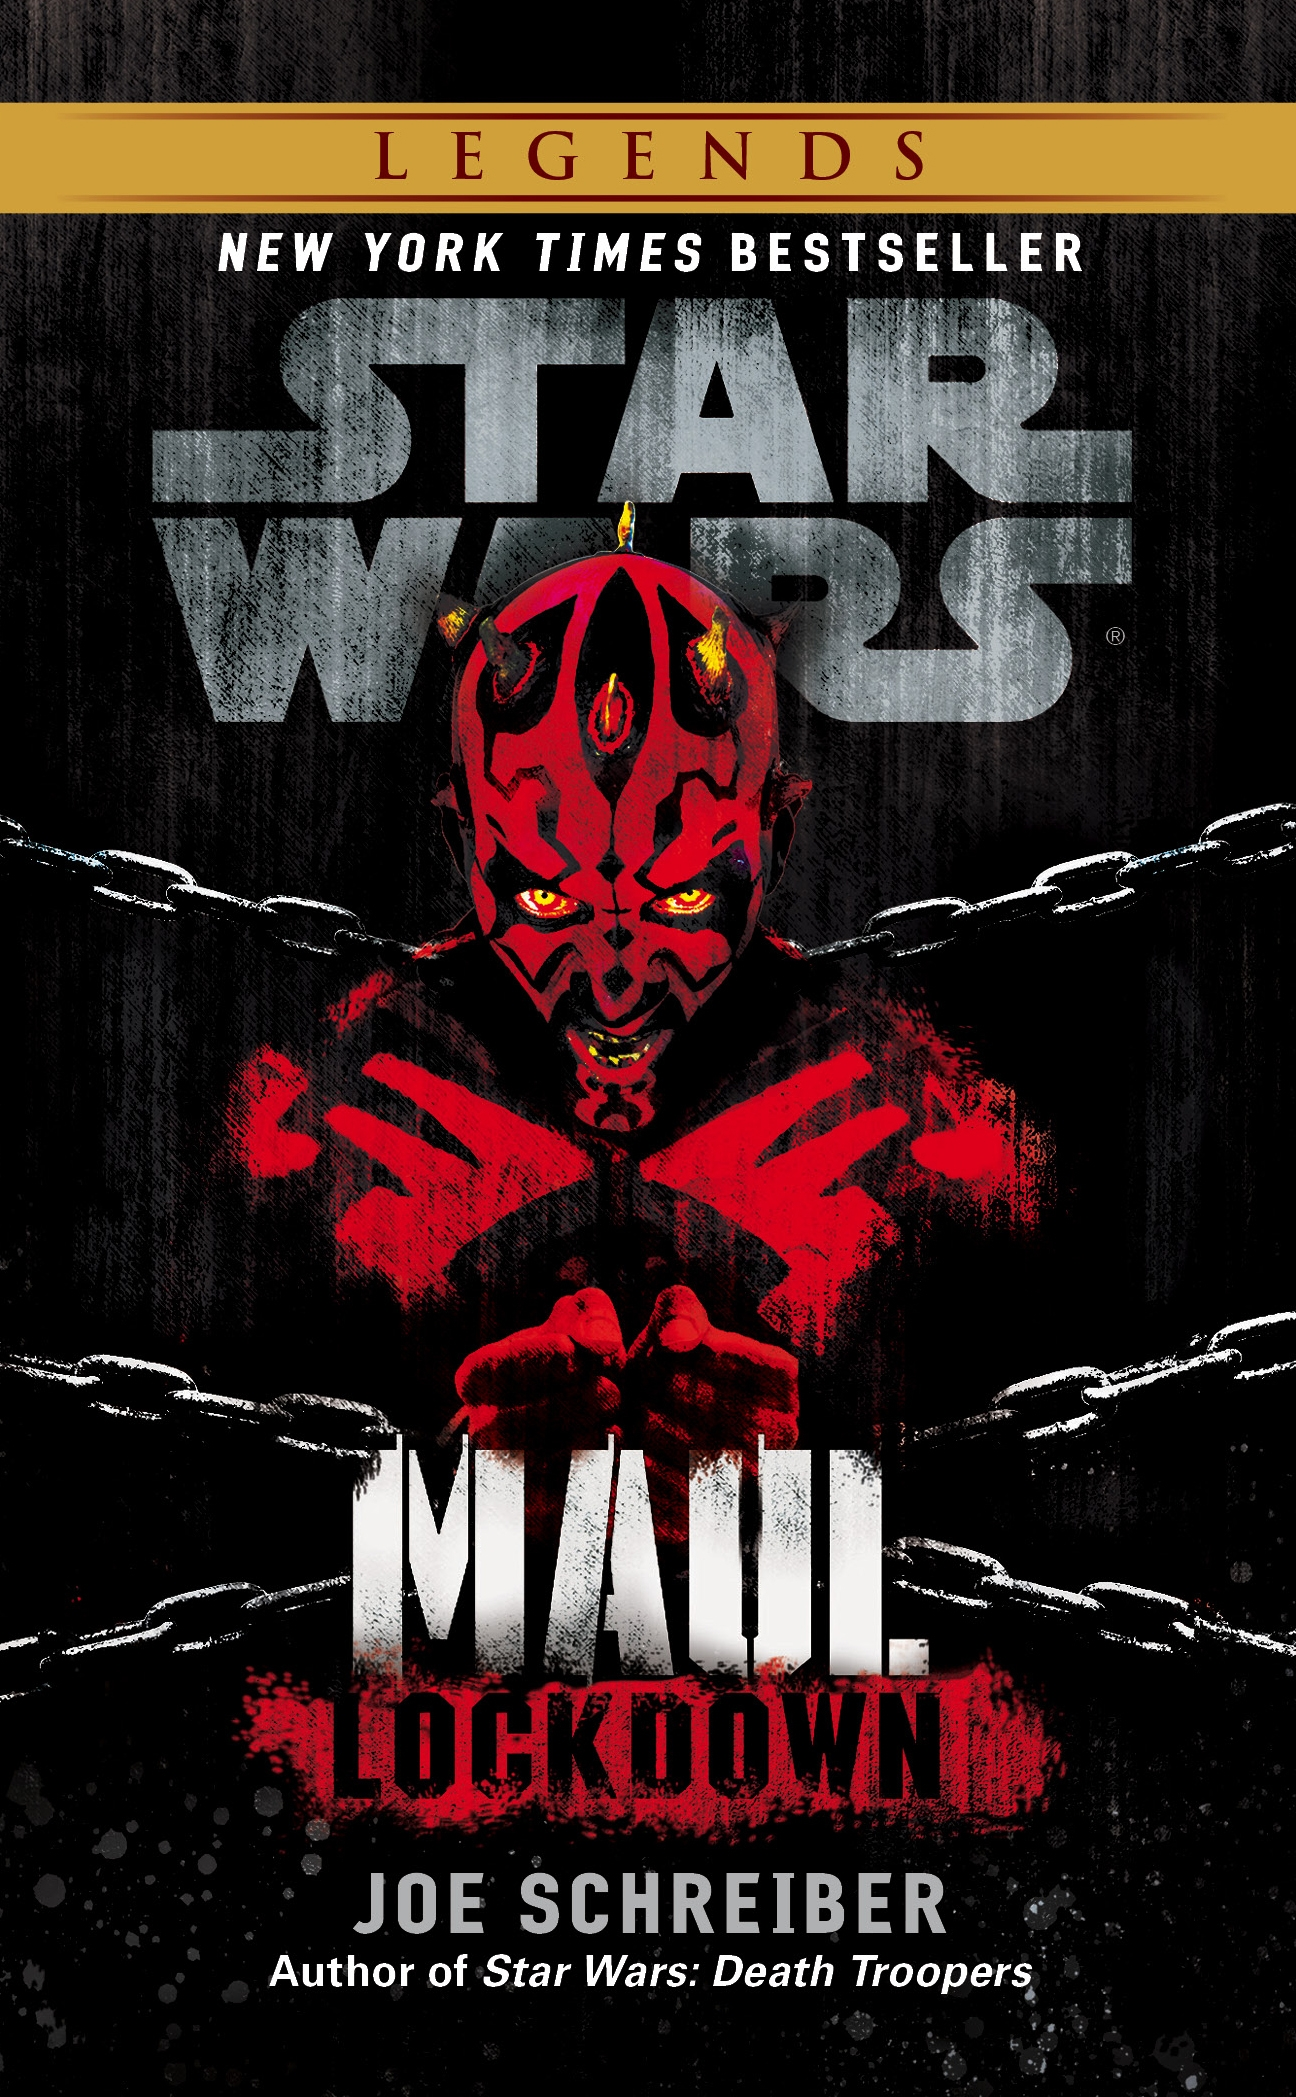 Star Wars - Maul - Lockdown Cover